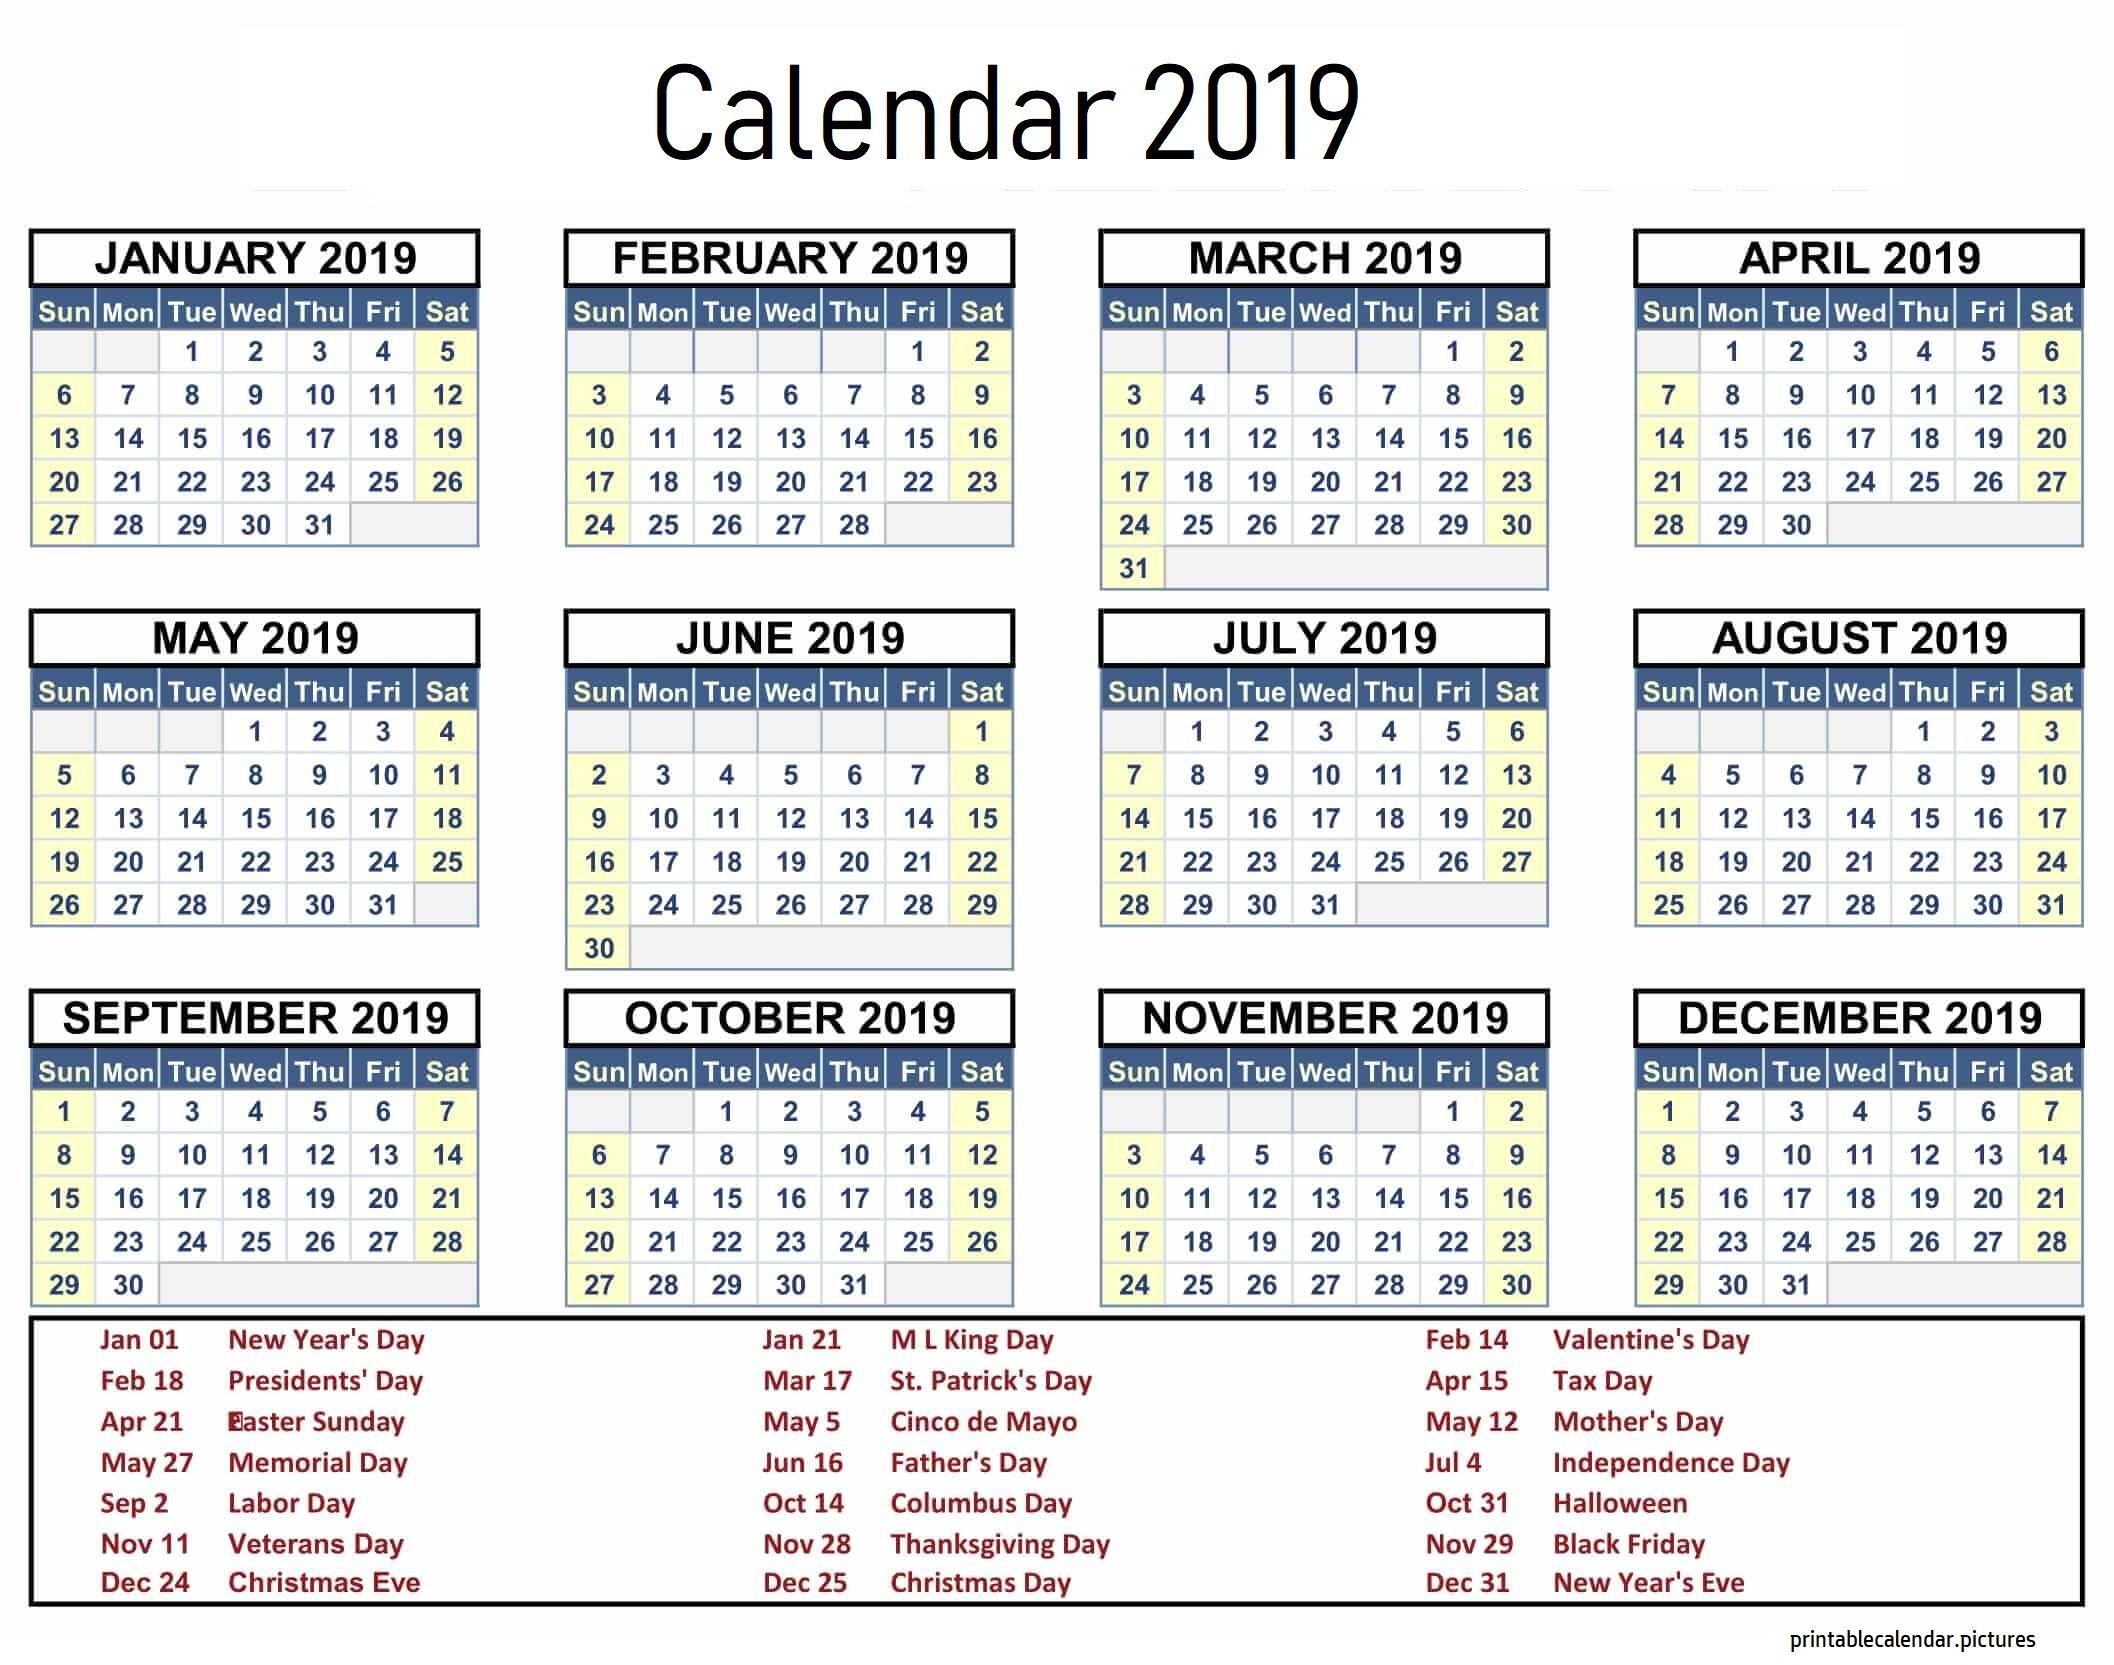 2019 Calendar Template With Holidays Calendar 2019 Template Calendar 2019 Printable Calendar Printables